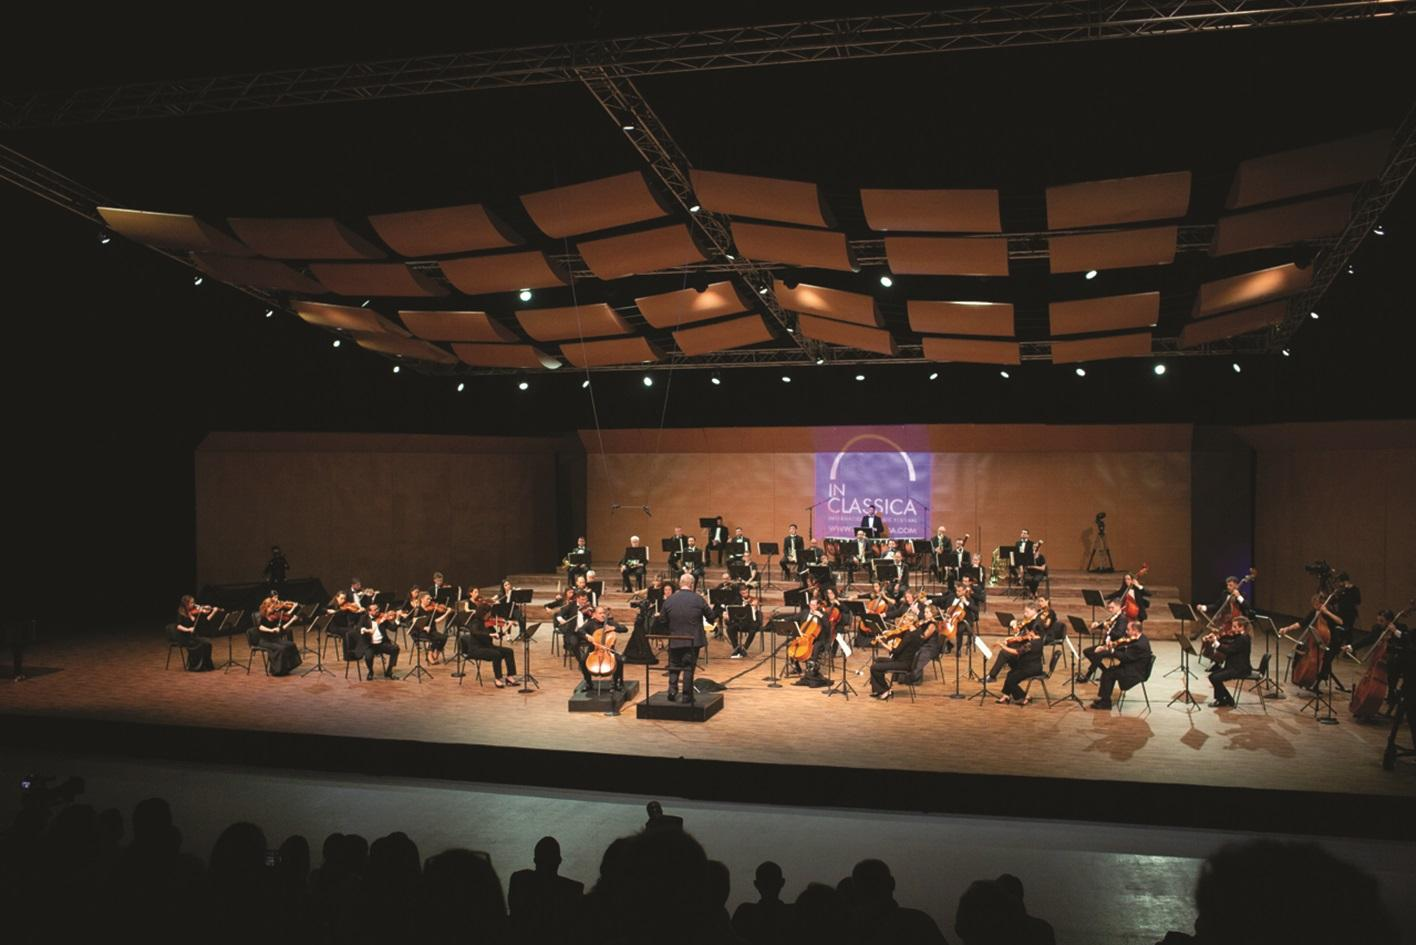 Malta's national orchestra in concert at the Coca-Cola Arena in Dubai. Photo: Evgeny Evtyukhov